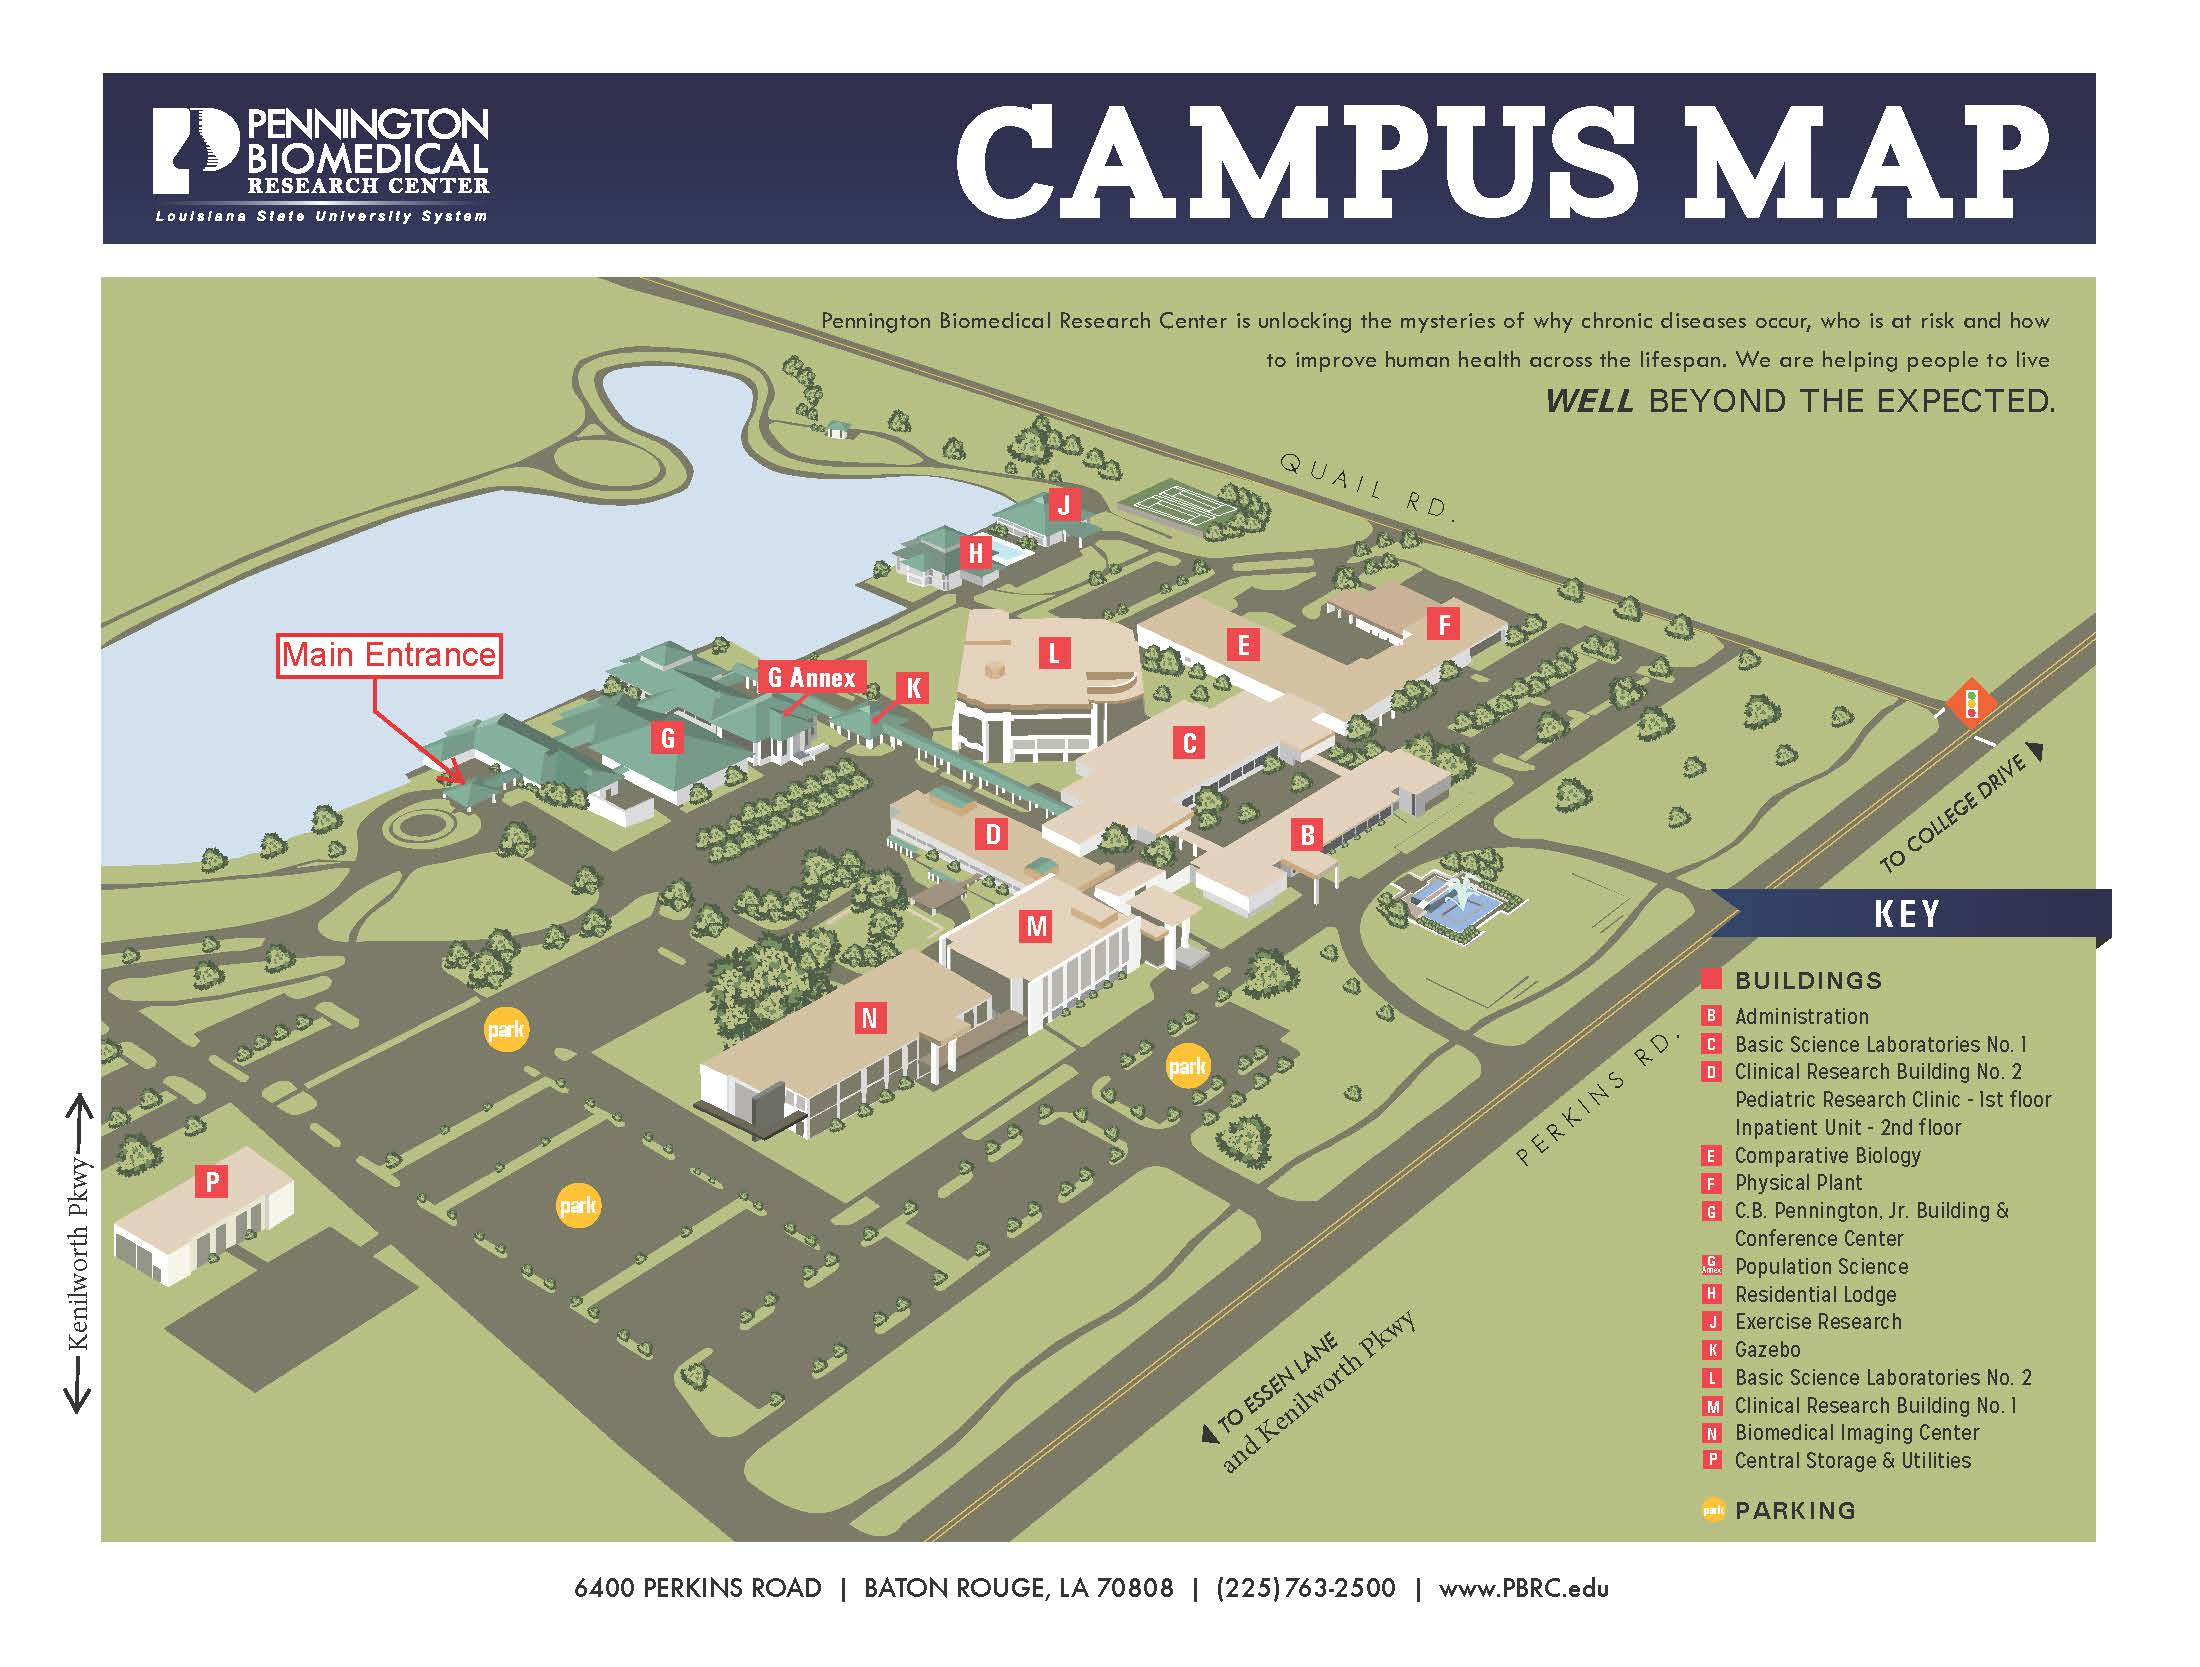 Pennington Biomedical Research Center Baton Rouge Louisiana